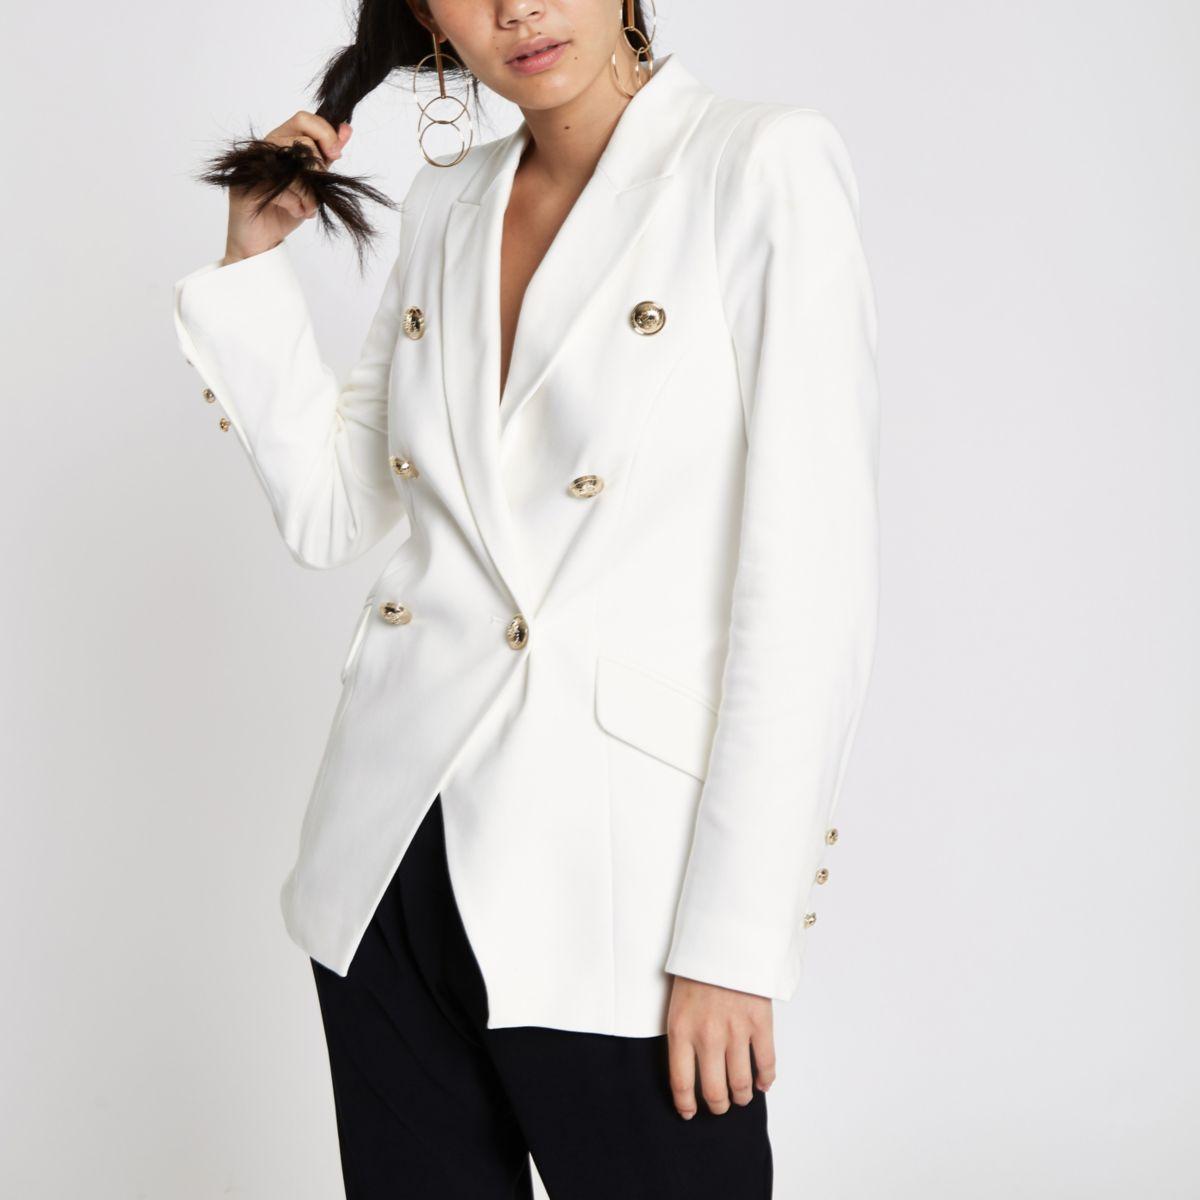 Weiße, zweireihige Jacke im Smokingstil